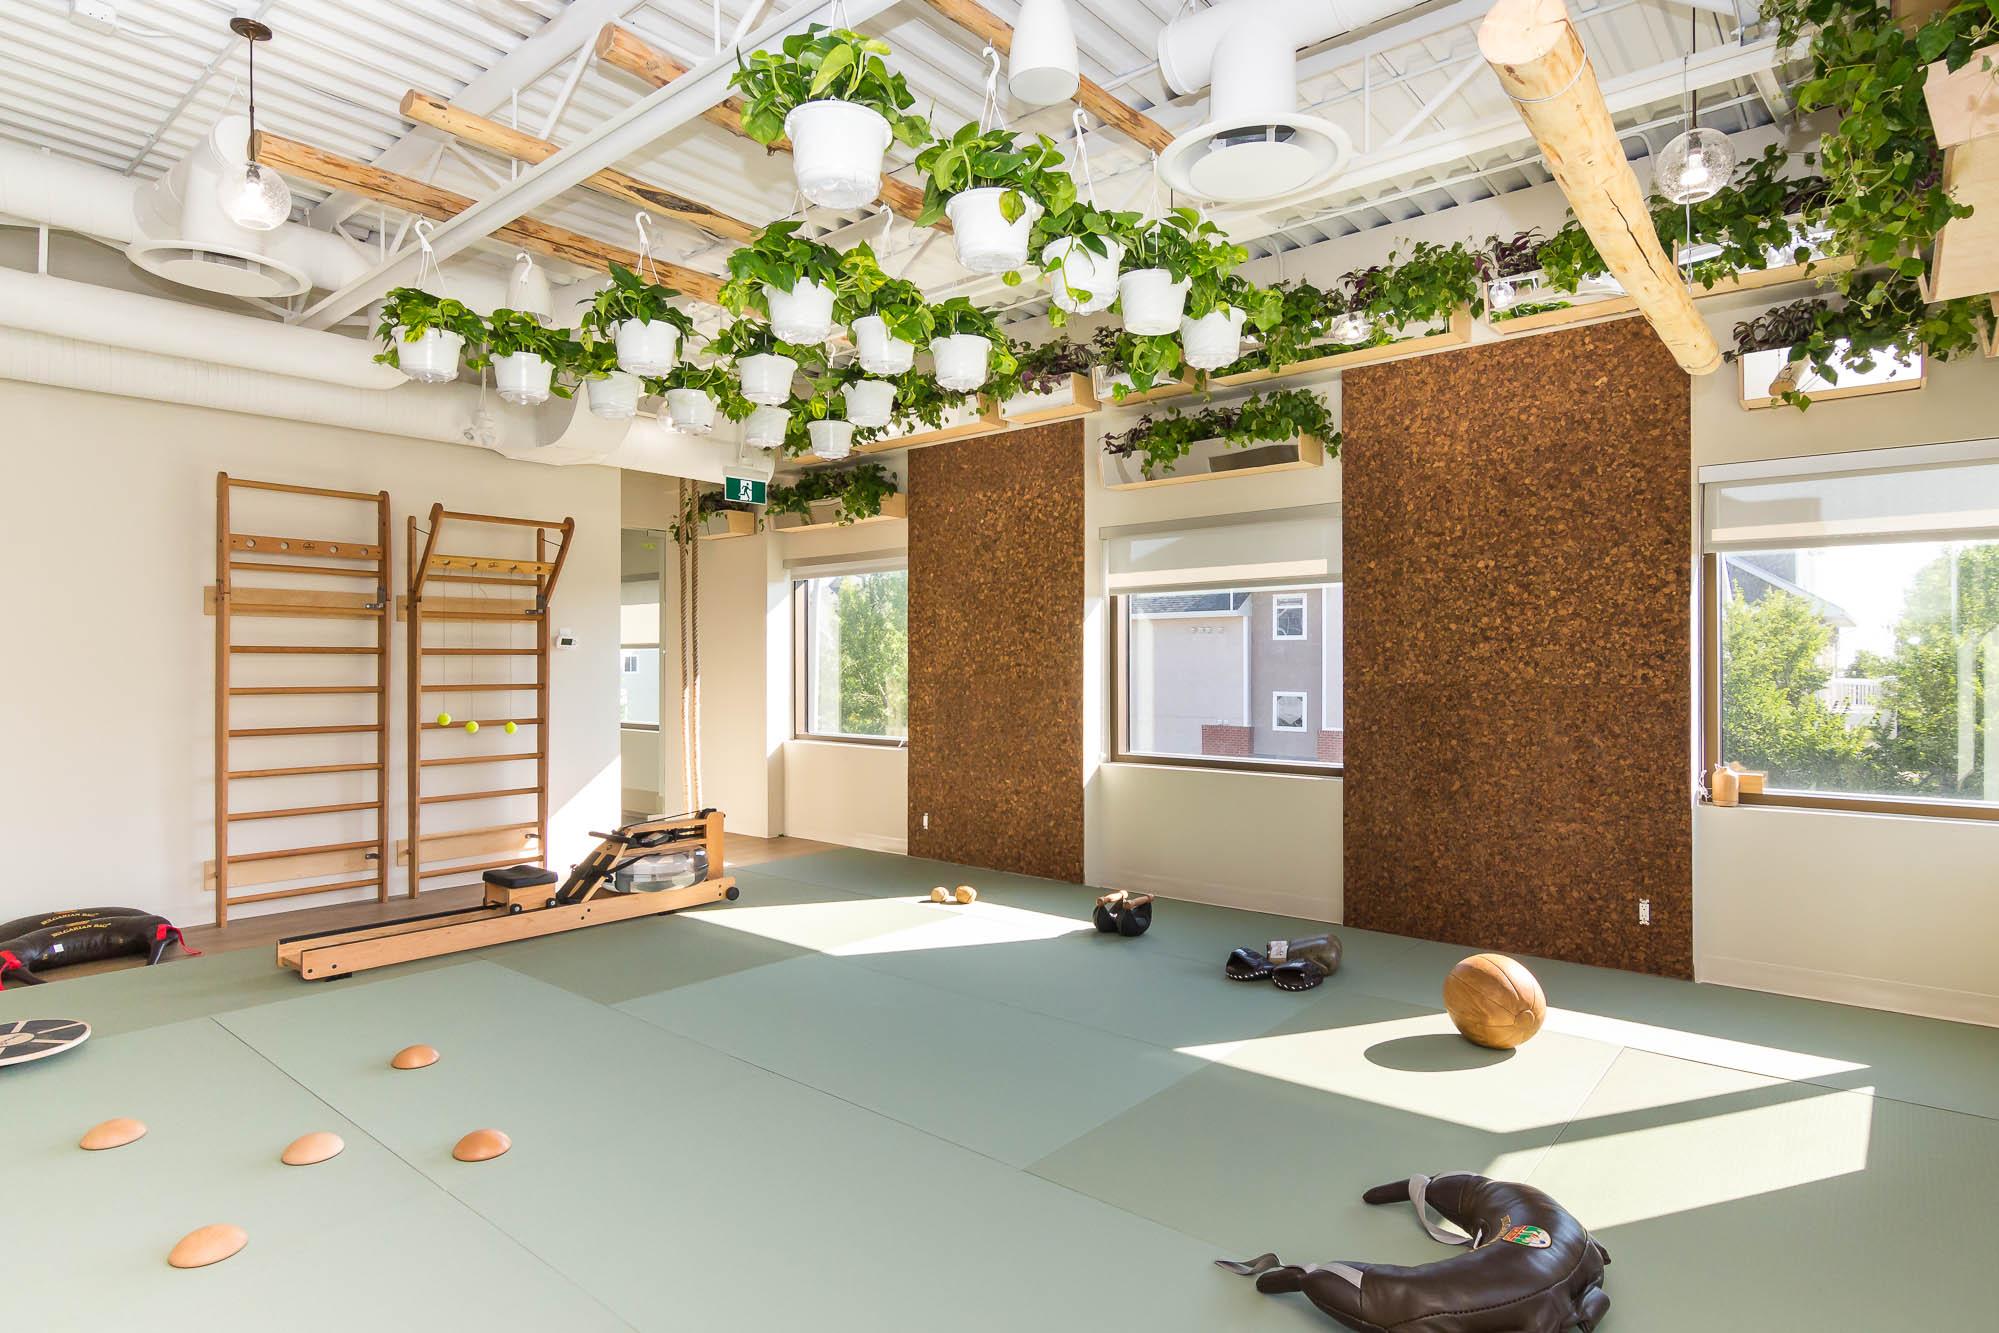 biofit biophilic gym design, calgary, canada